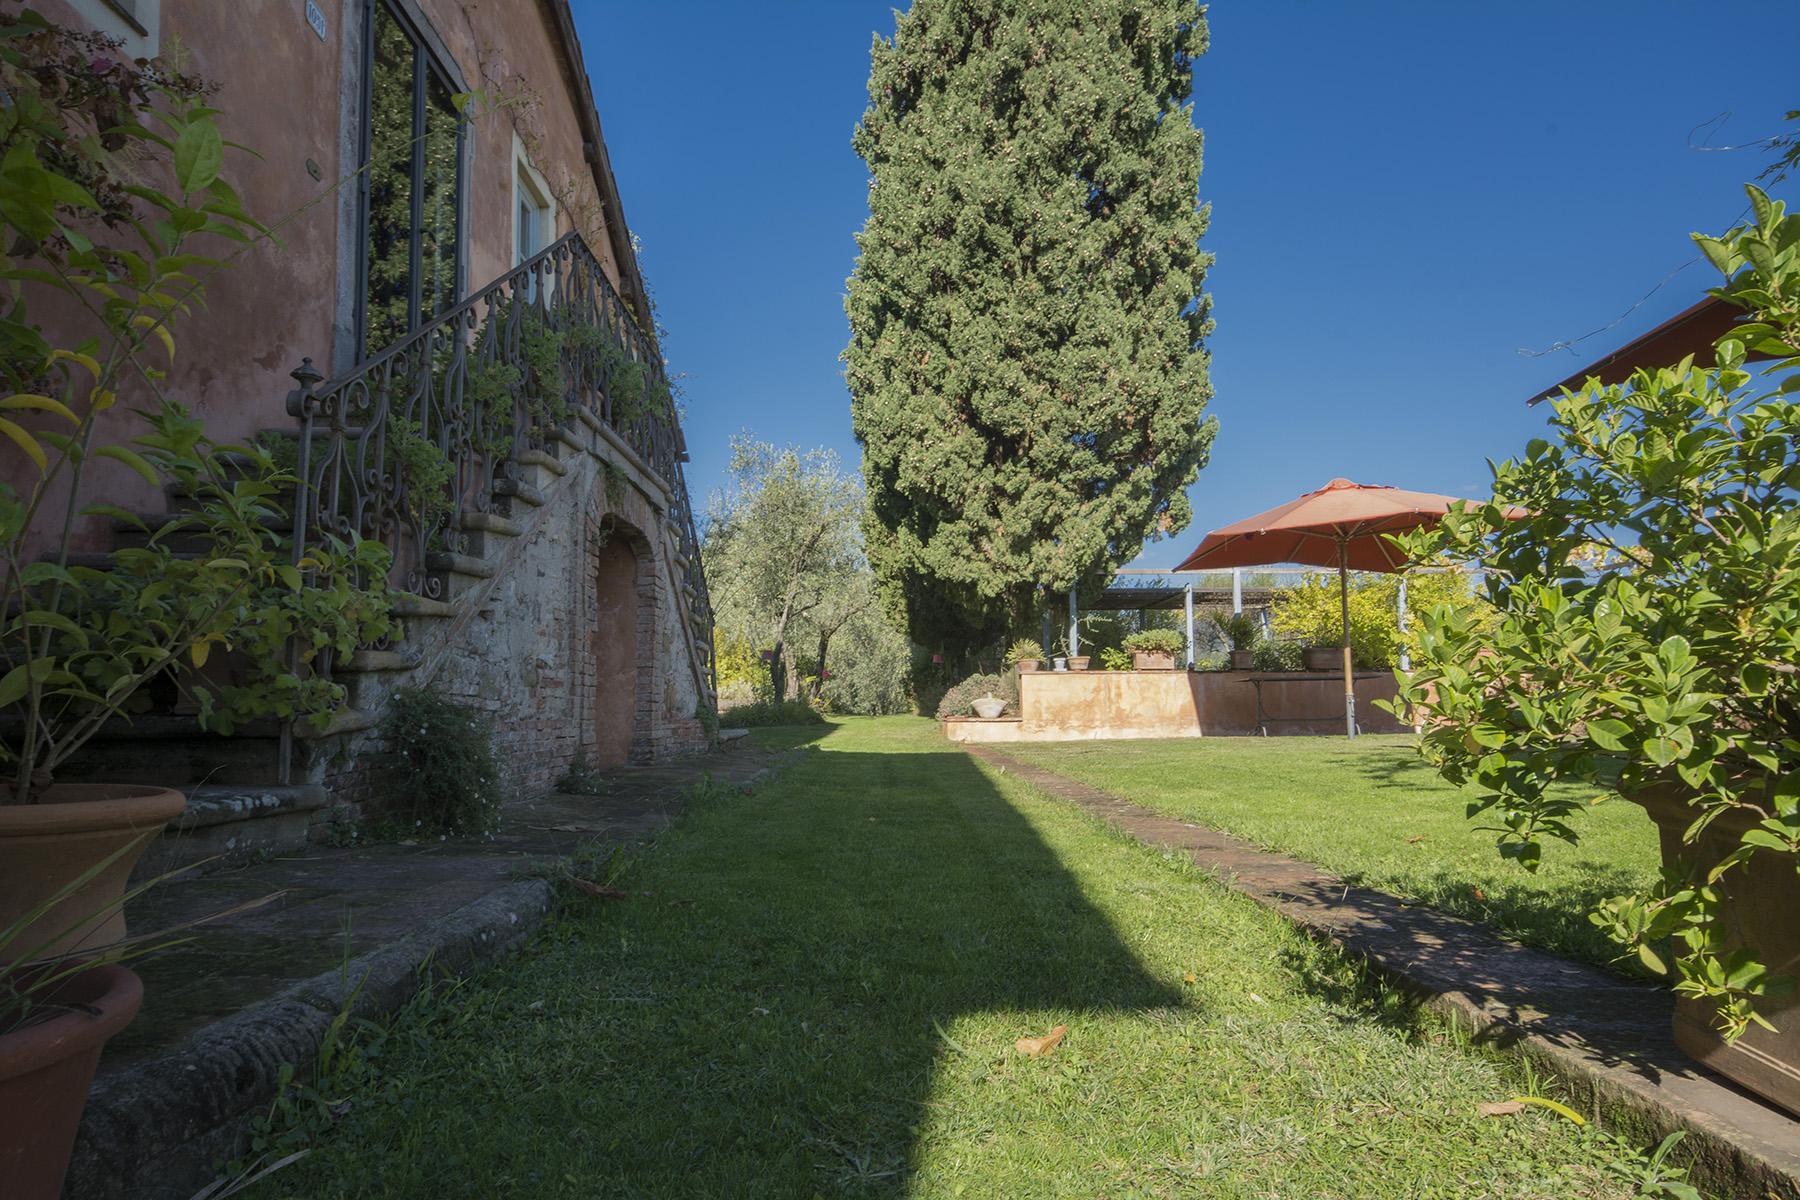 Rustico in Vendita a Lucca: 5 locali, 540 mq - Foto 14